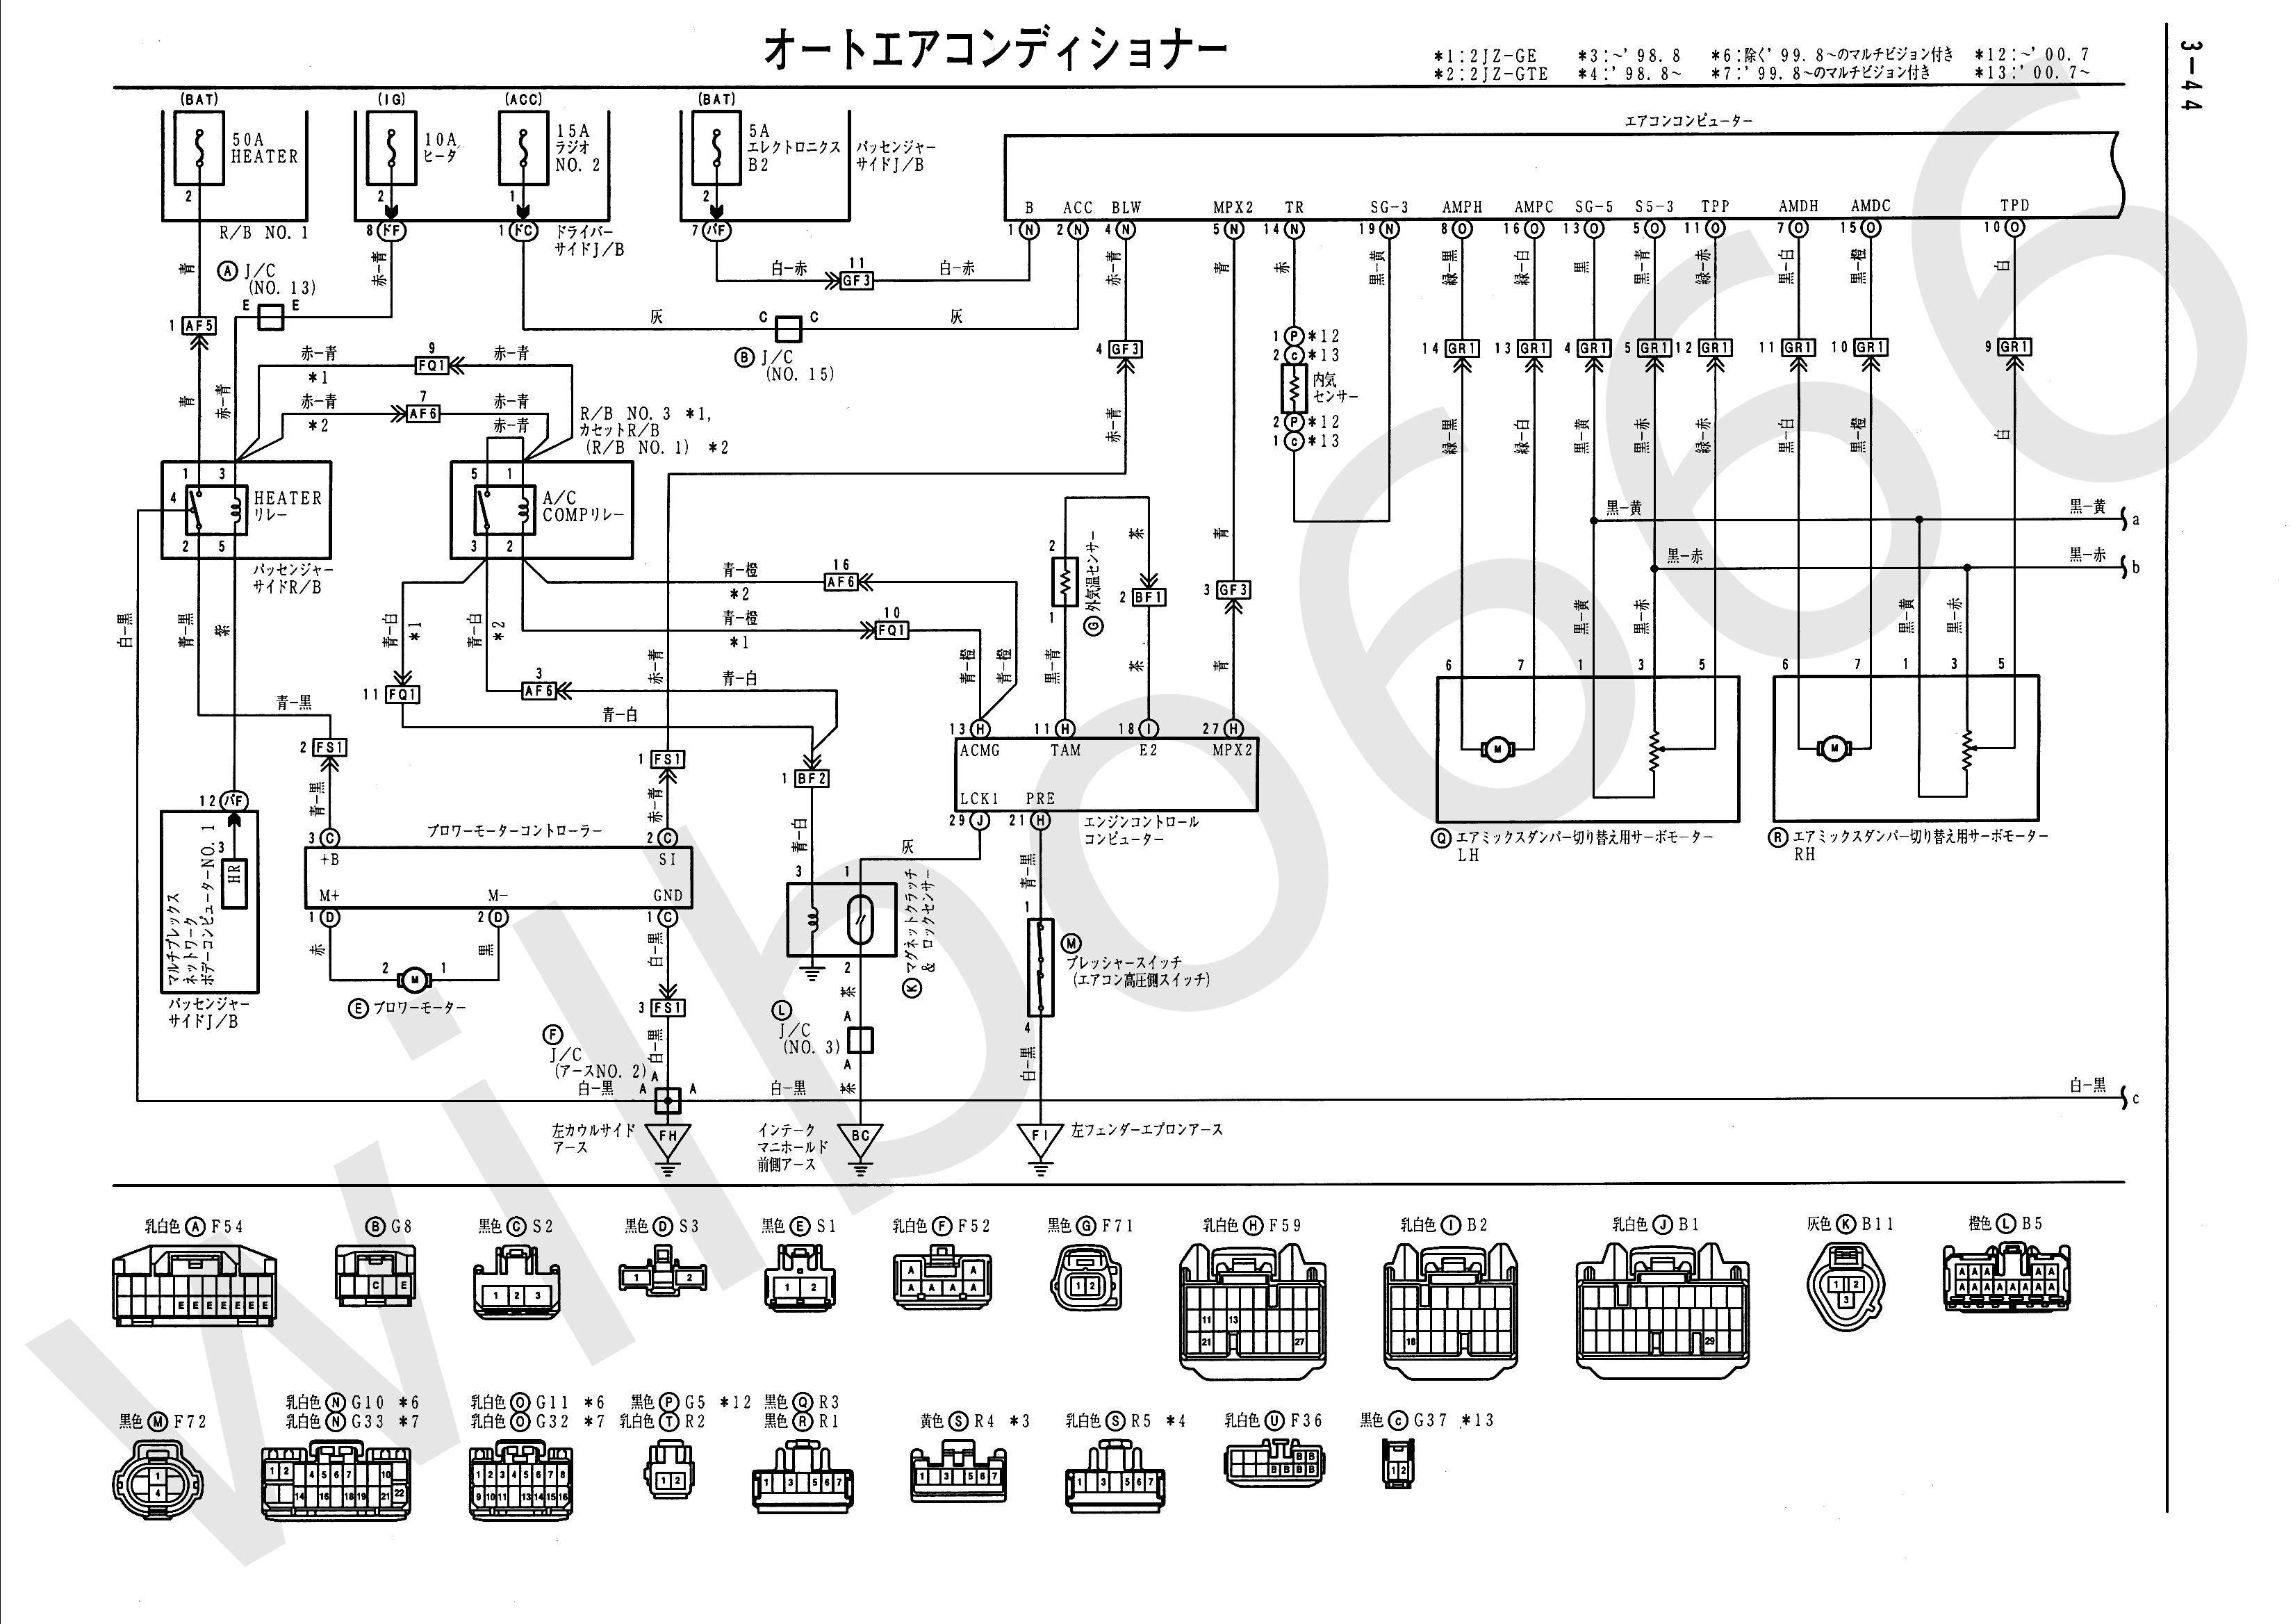 JZS161 Electrical Wiring Diagram 6748505 3 44 ���������� aristo jzs161 www supra club ru aristo wiring diagram at nearapp.co